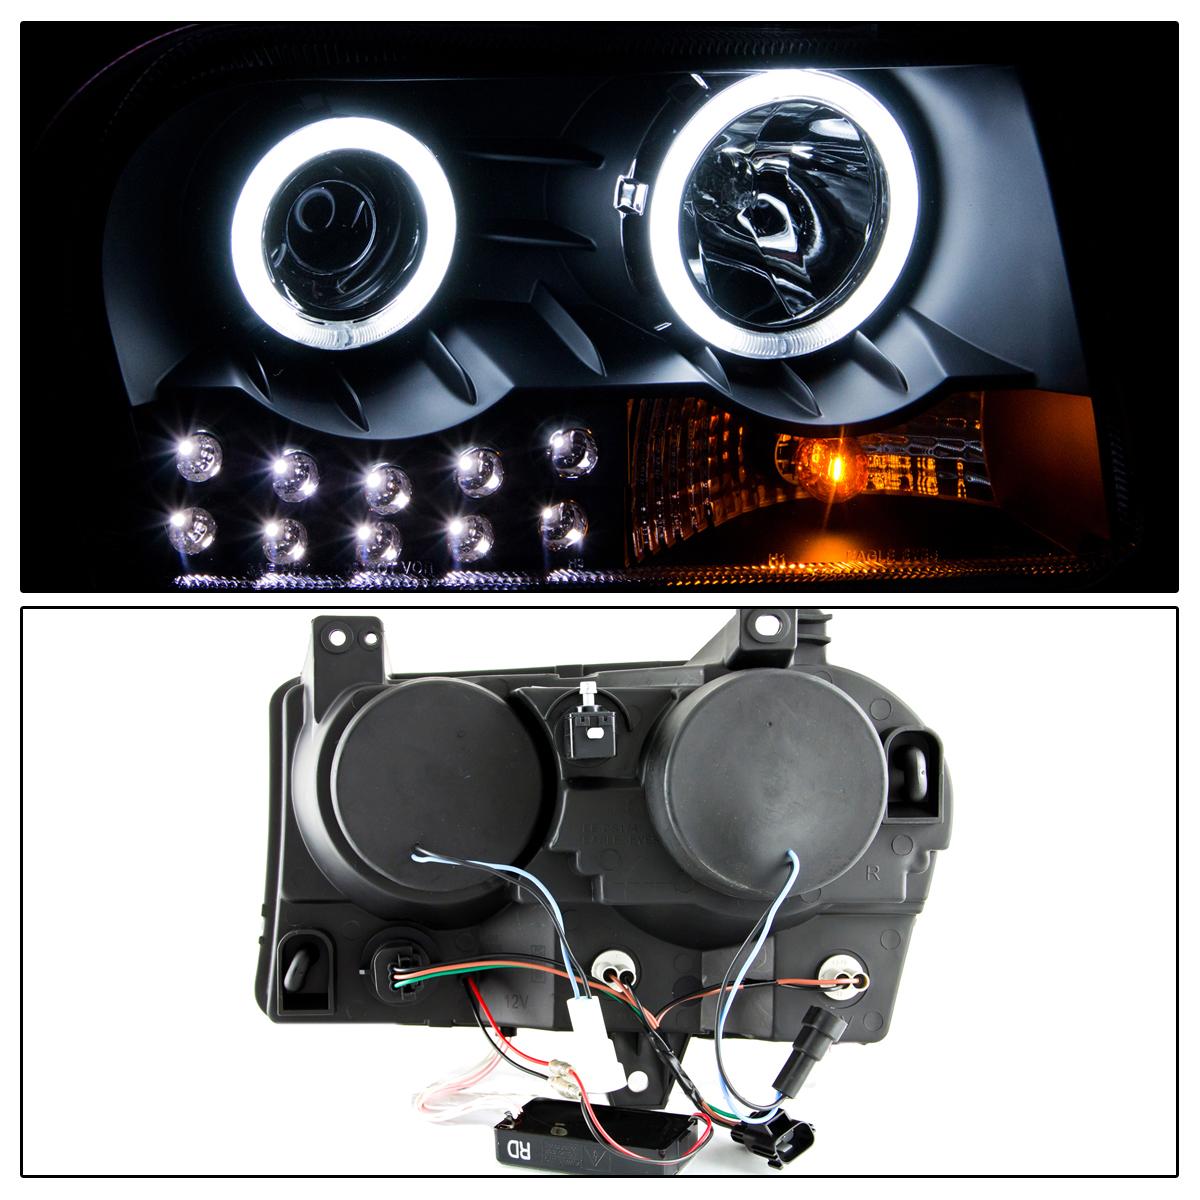 2005 2006 2007 2008 2009 2010 Chrysler 300 300c Black Mesh: [Dual CCFL Halo] 2005-2010 Chrysler 300 Black LED DRL